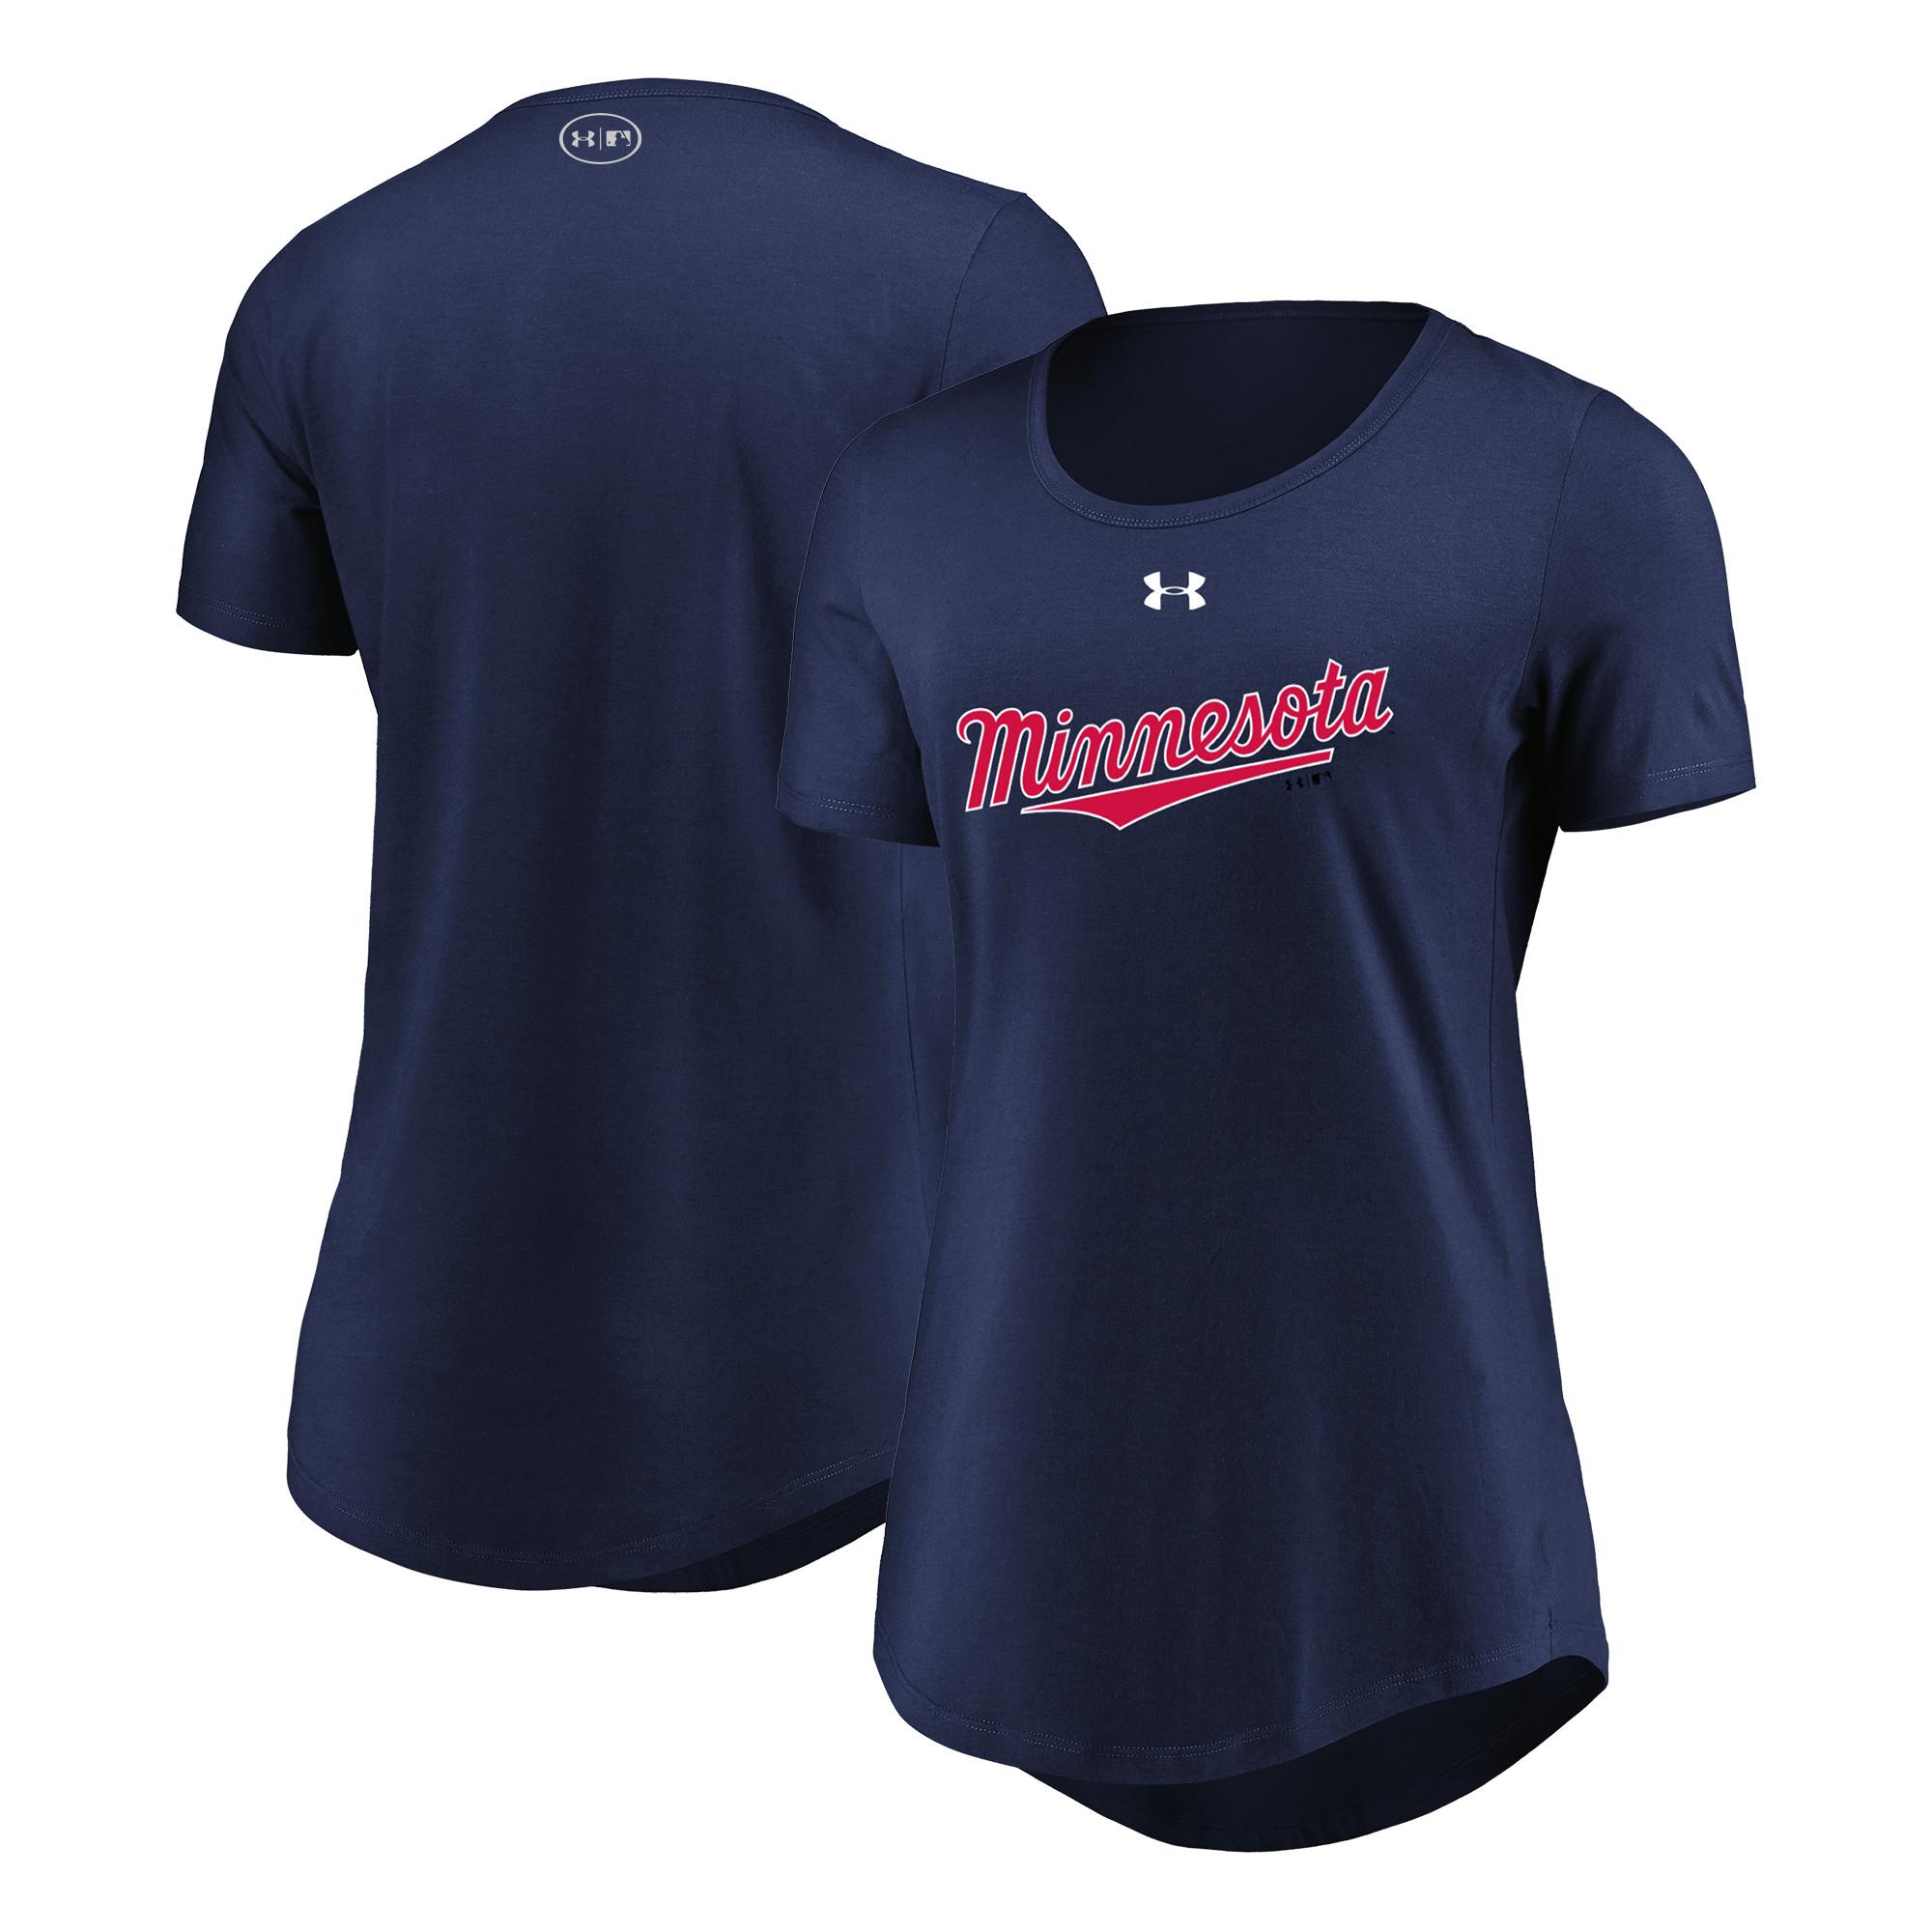 Minnesota Twins Under Armour Women's Passion Road Team Font Scoop Performance Tri-Blend T-Shirt - Navy